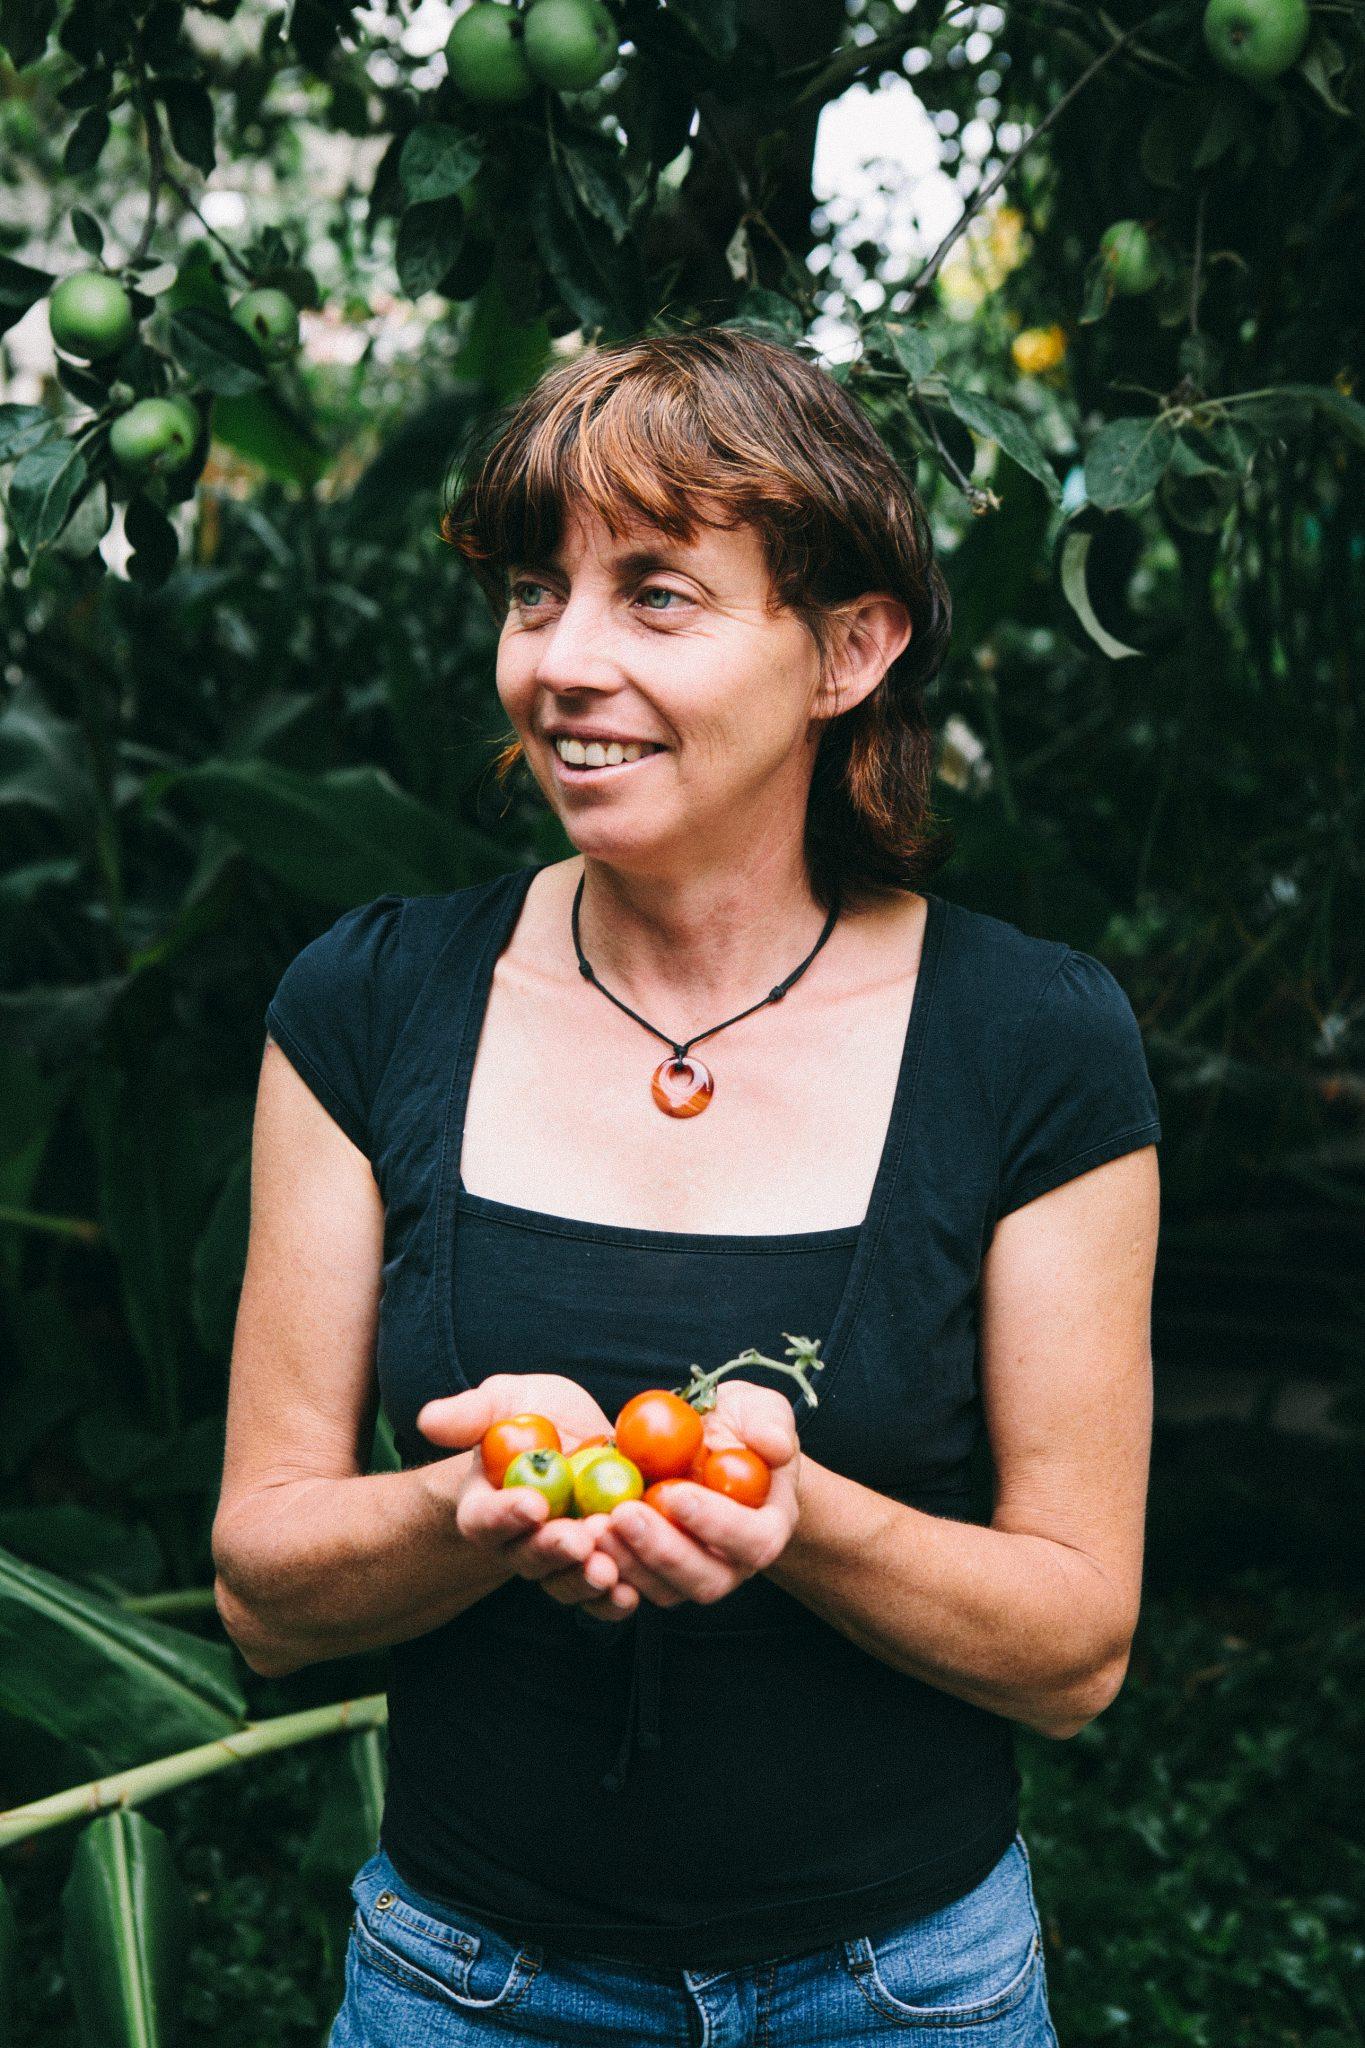 Karen holding tomatoes